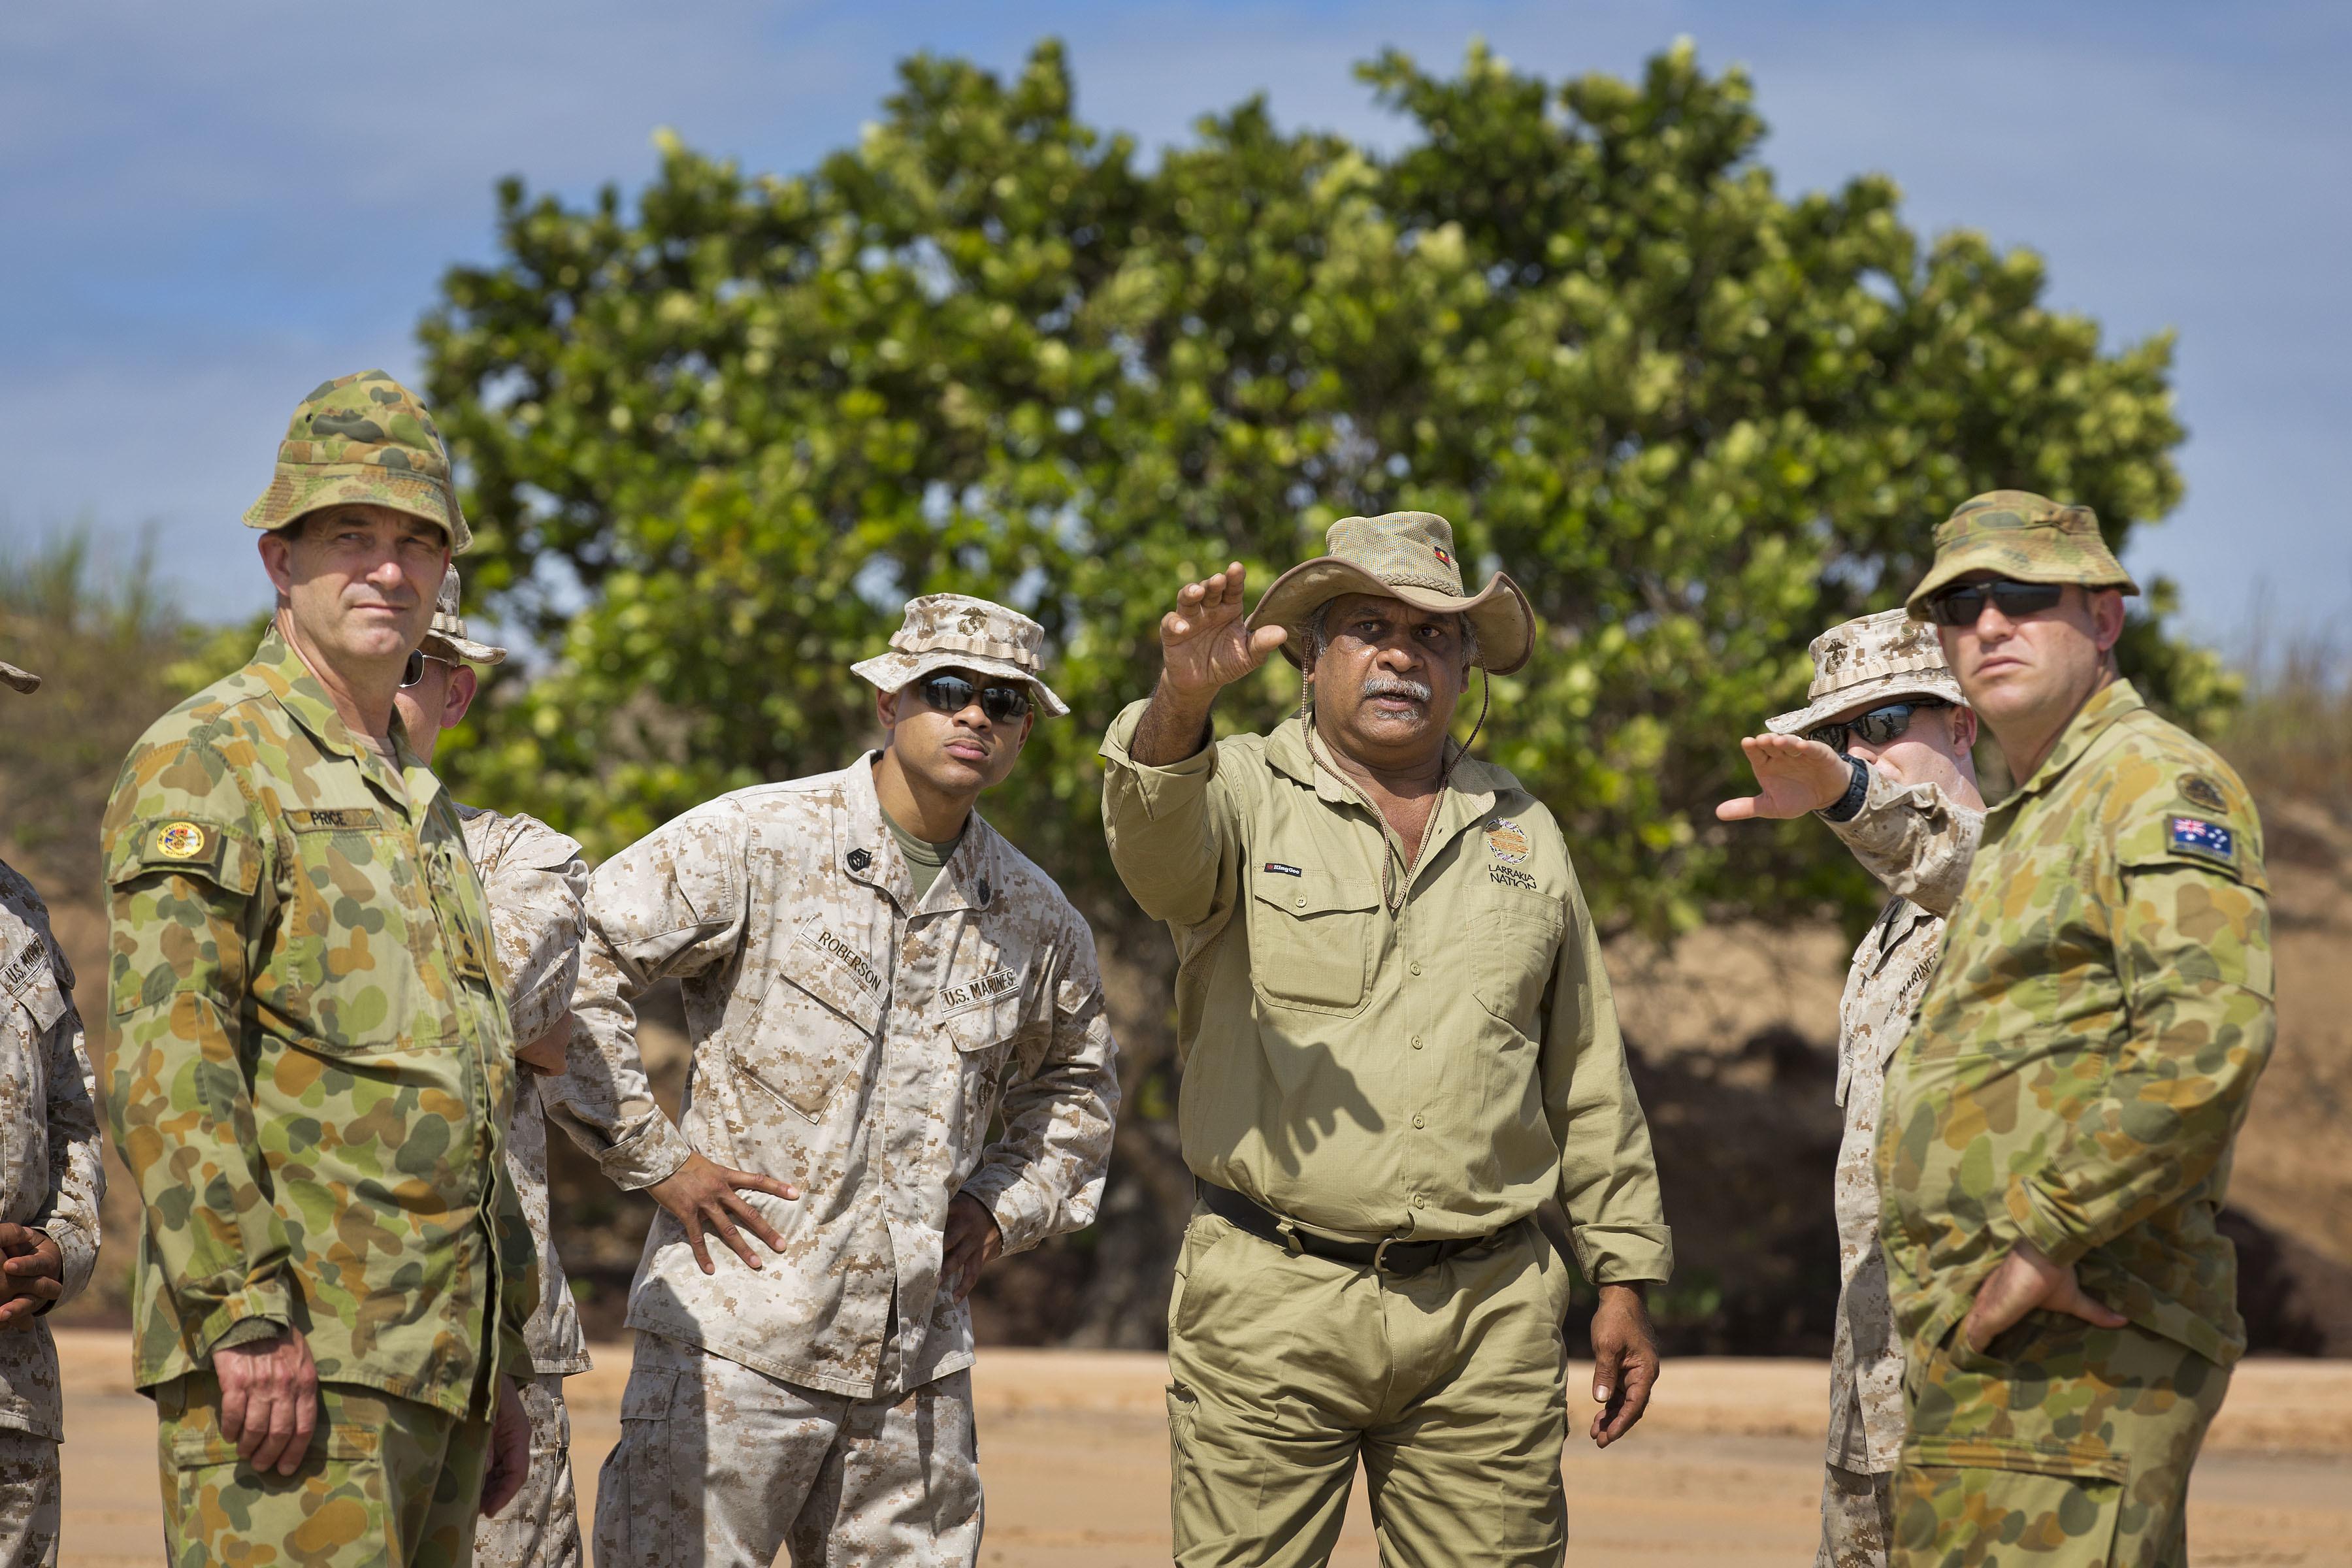 united states marine corps reserve